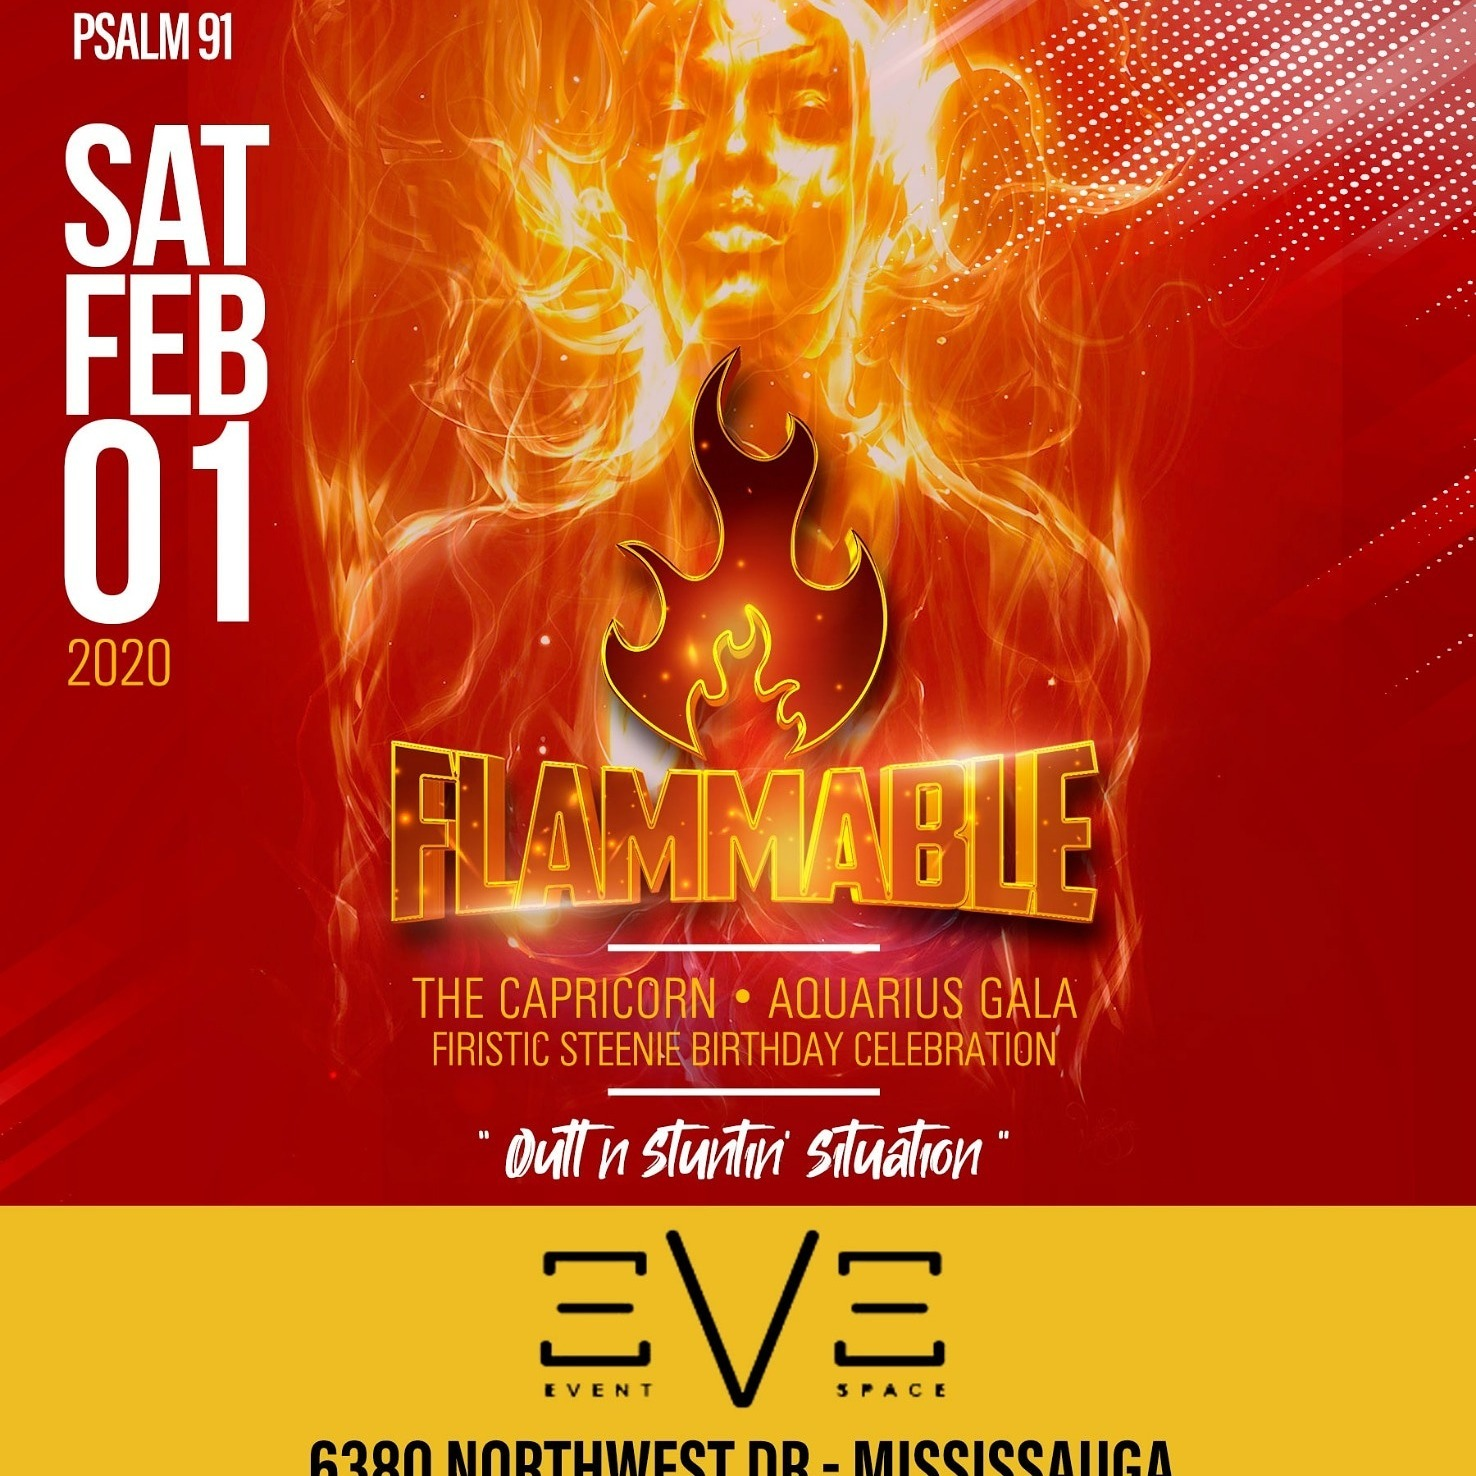 Flammable - Firistic Steenie Birthday Celebration